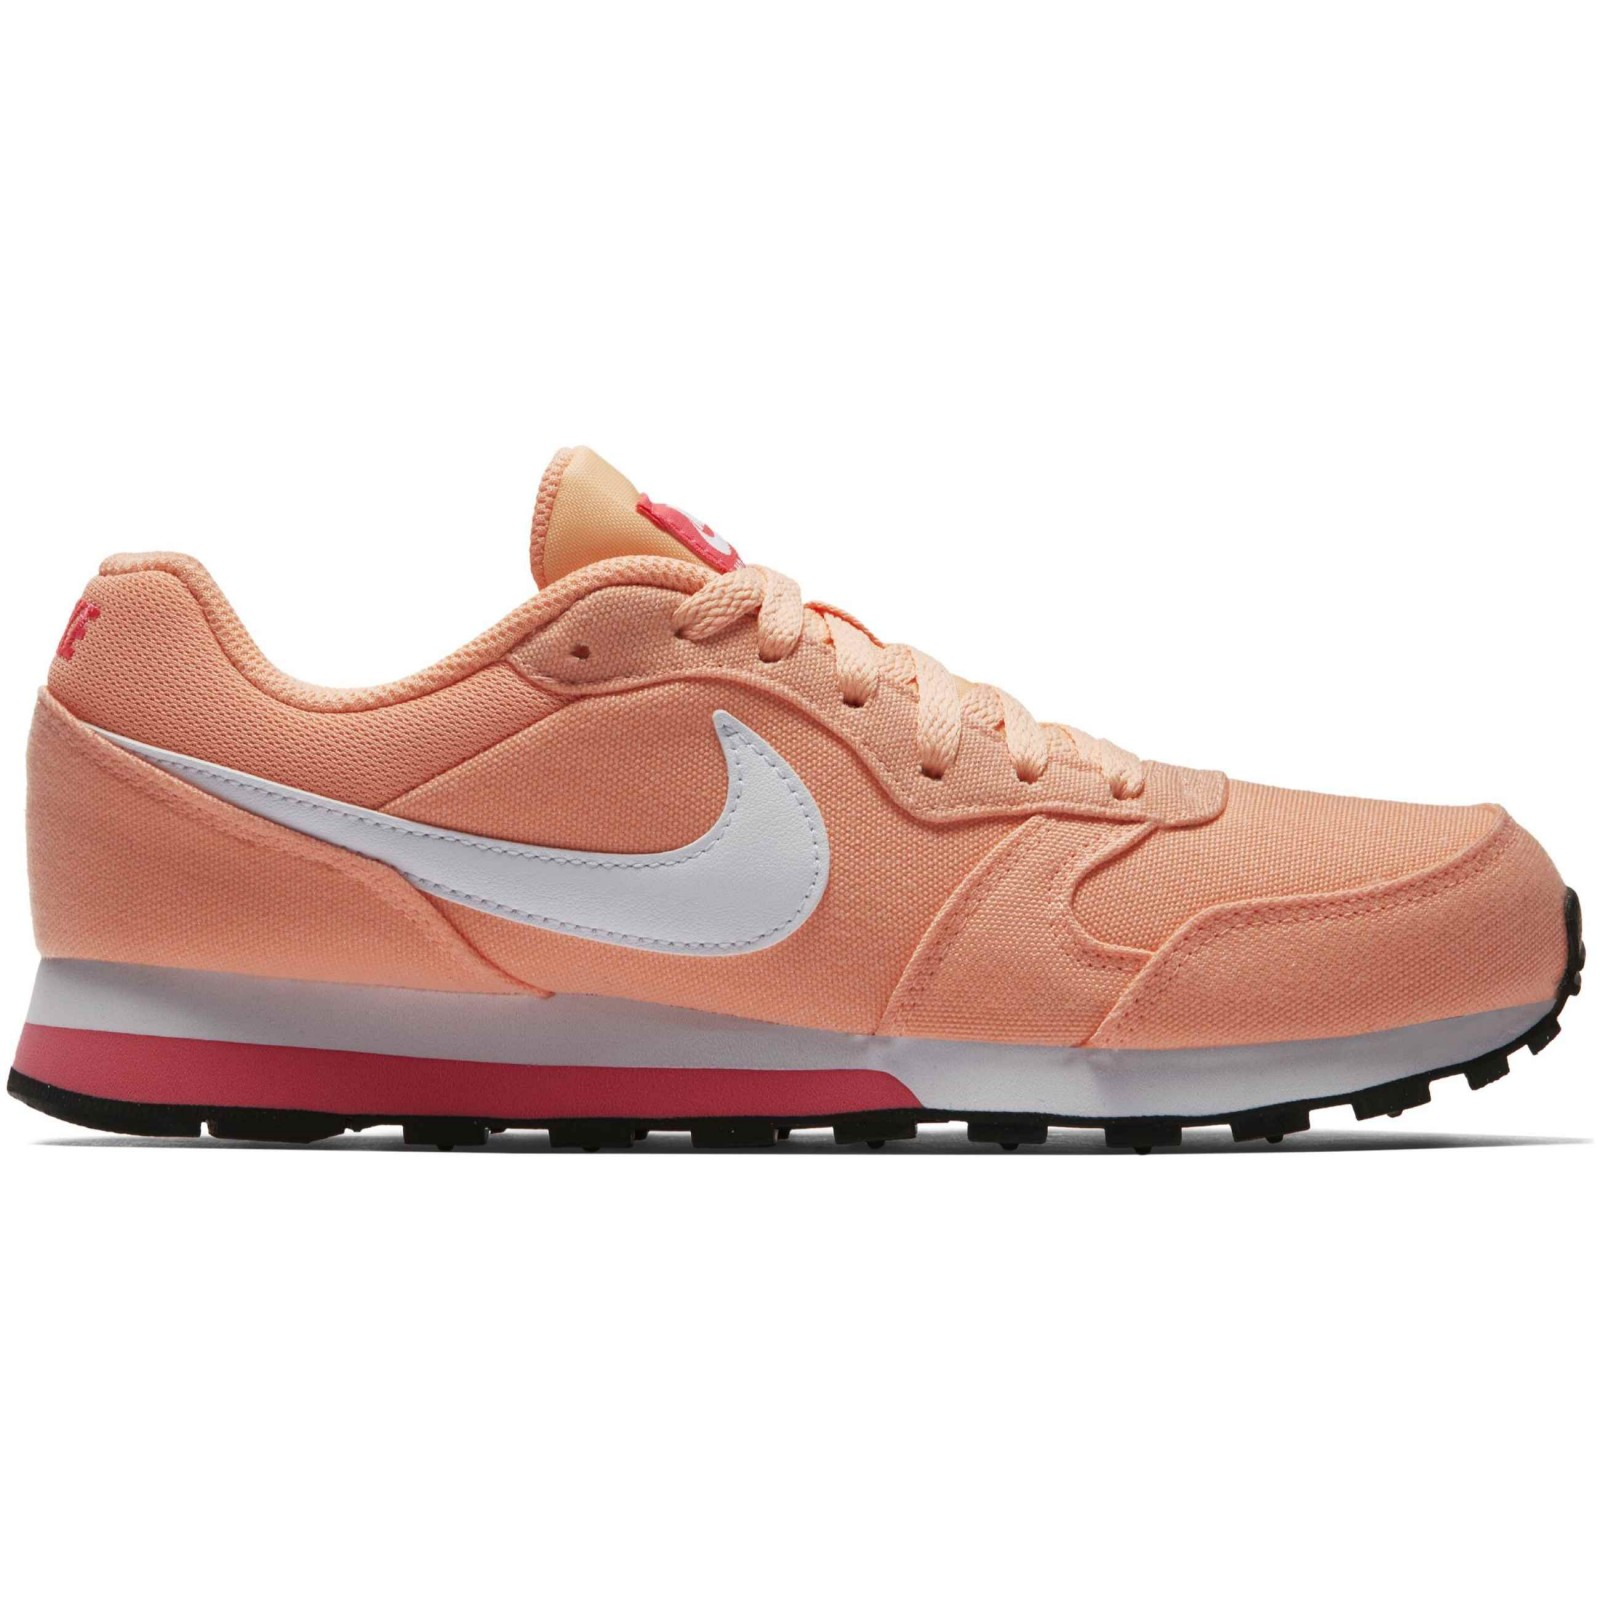 0869b555b2 Dámské tenisky Nike WMNS MD RUNNER 2